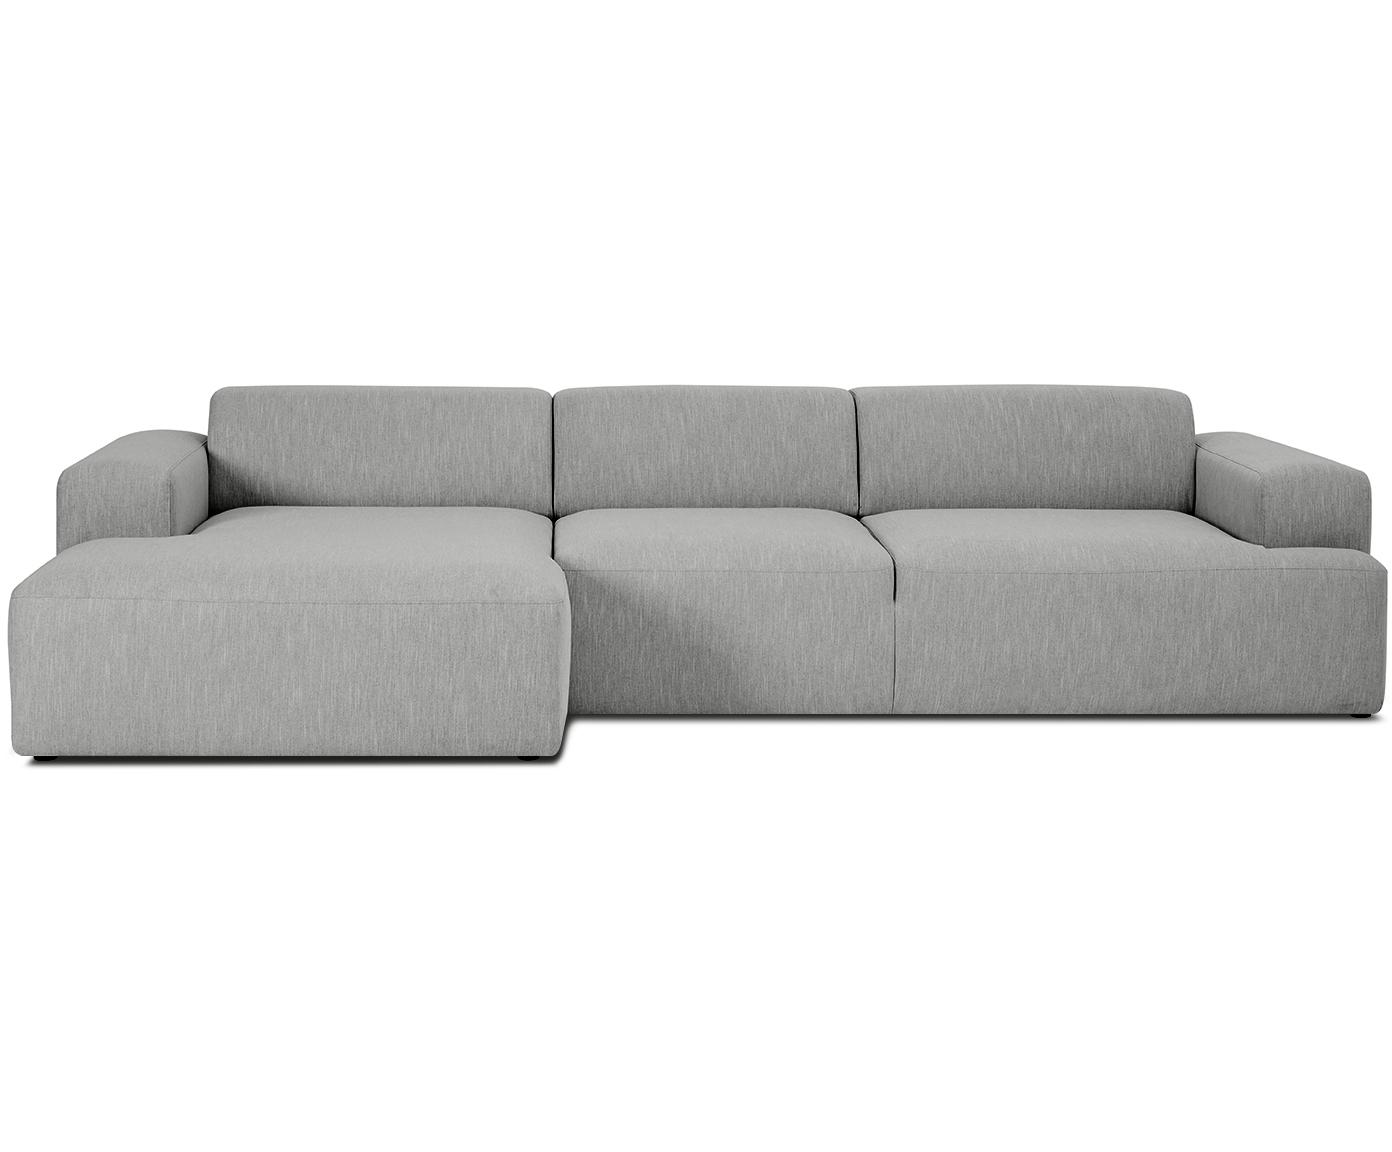 Ecksofa Melva (4-Sitzer), Bezug: Polyester 35.000 Scheuert, Gestell: Massives Kiefernholz, Spa, Webstoff Grau, B 319 x T 144 cm